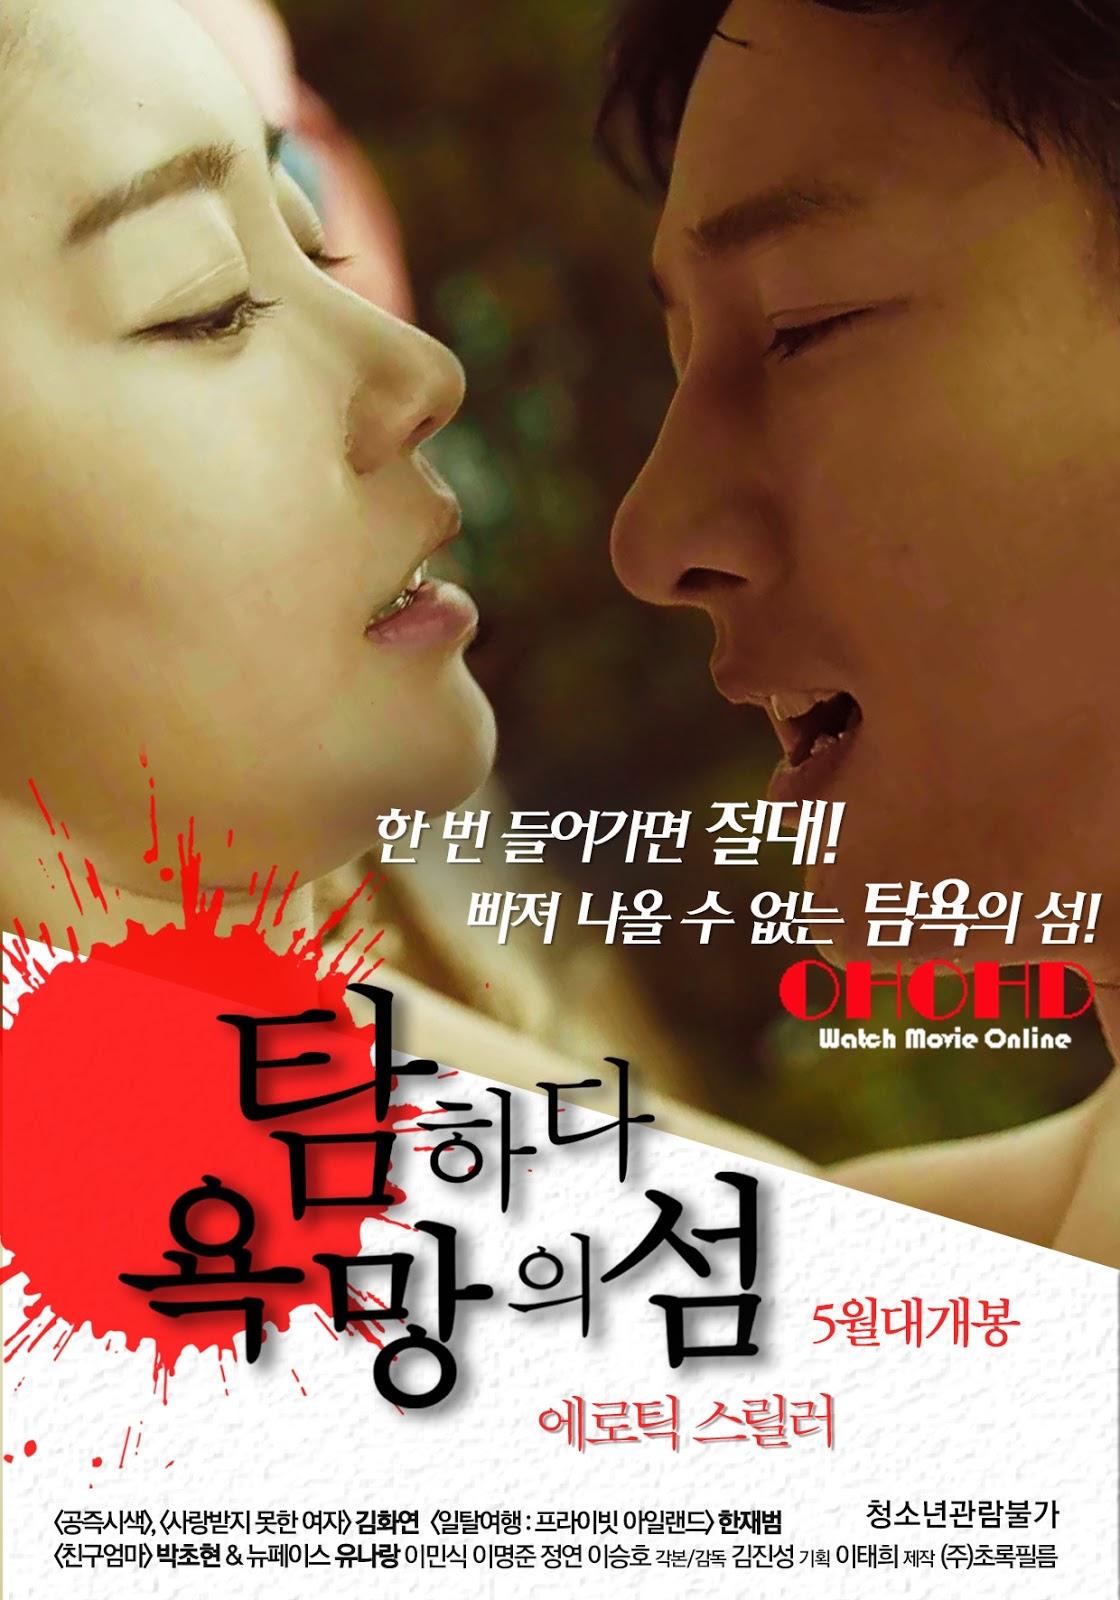 Covet Island of Desire (2017) 탐하다:욕망의 섬 [เกาหลี 18+] [Soundtrack ไม่มีบรรยายไทย]